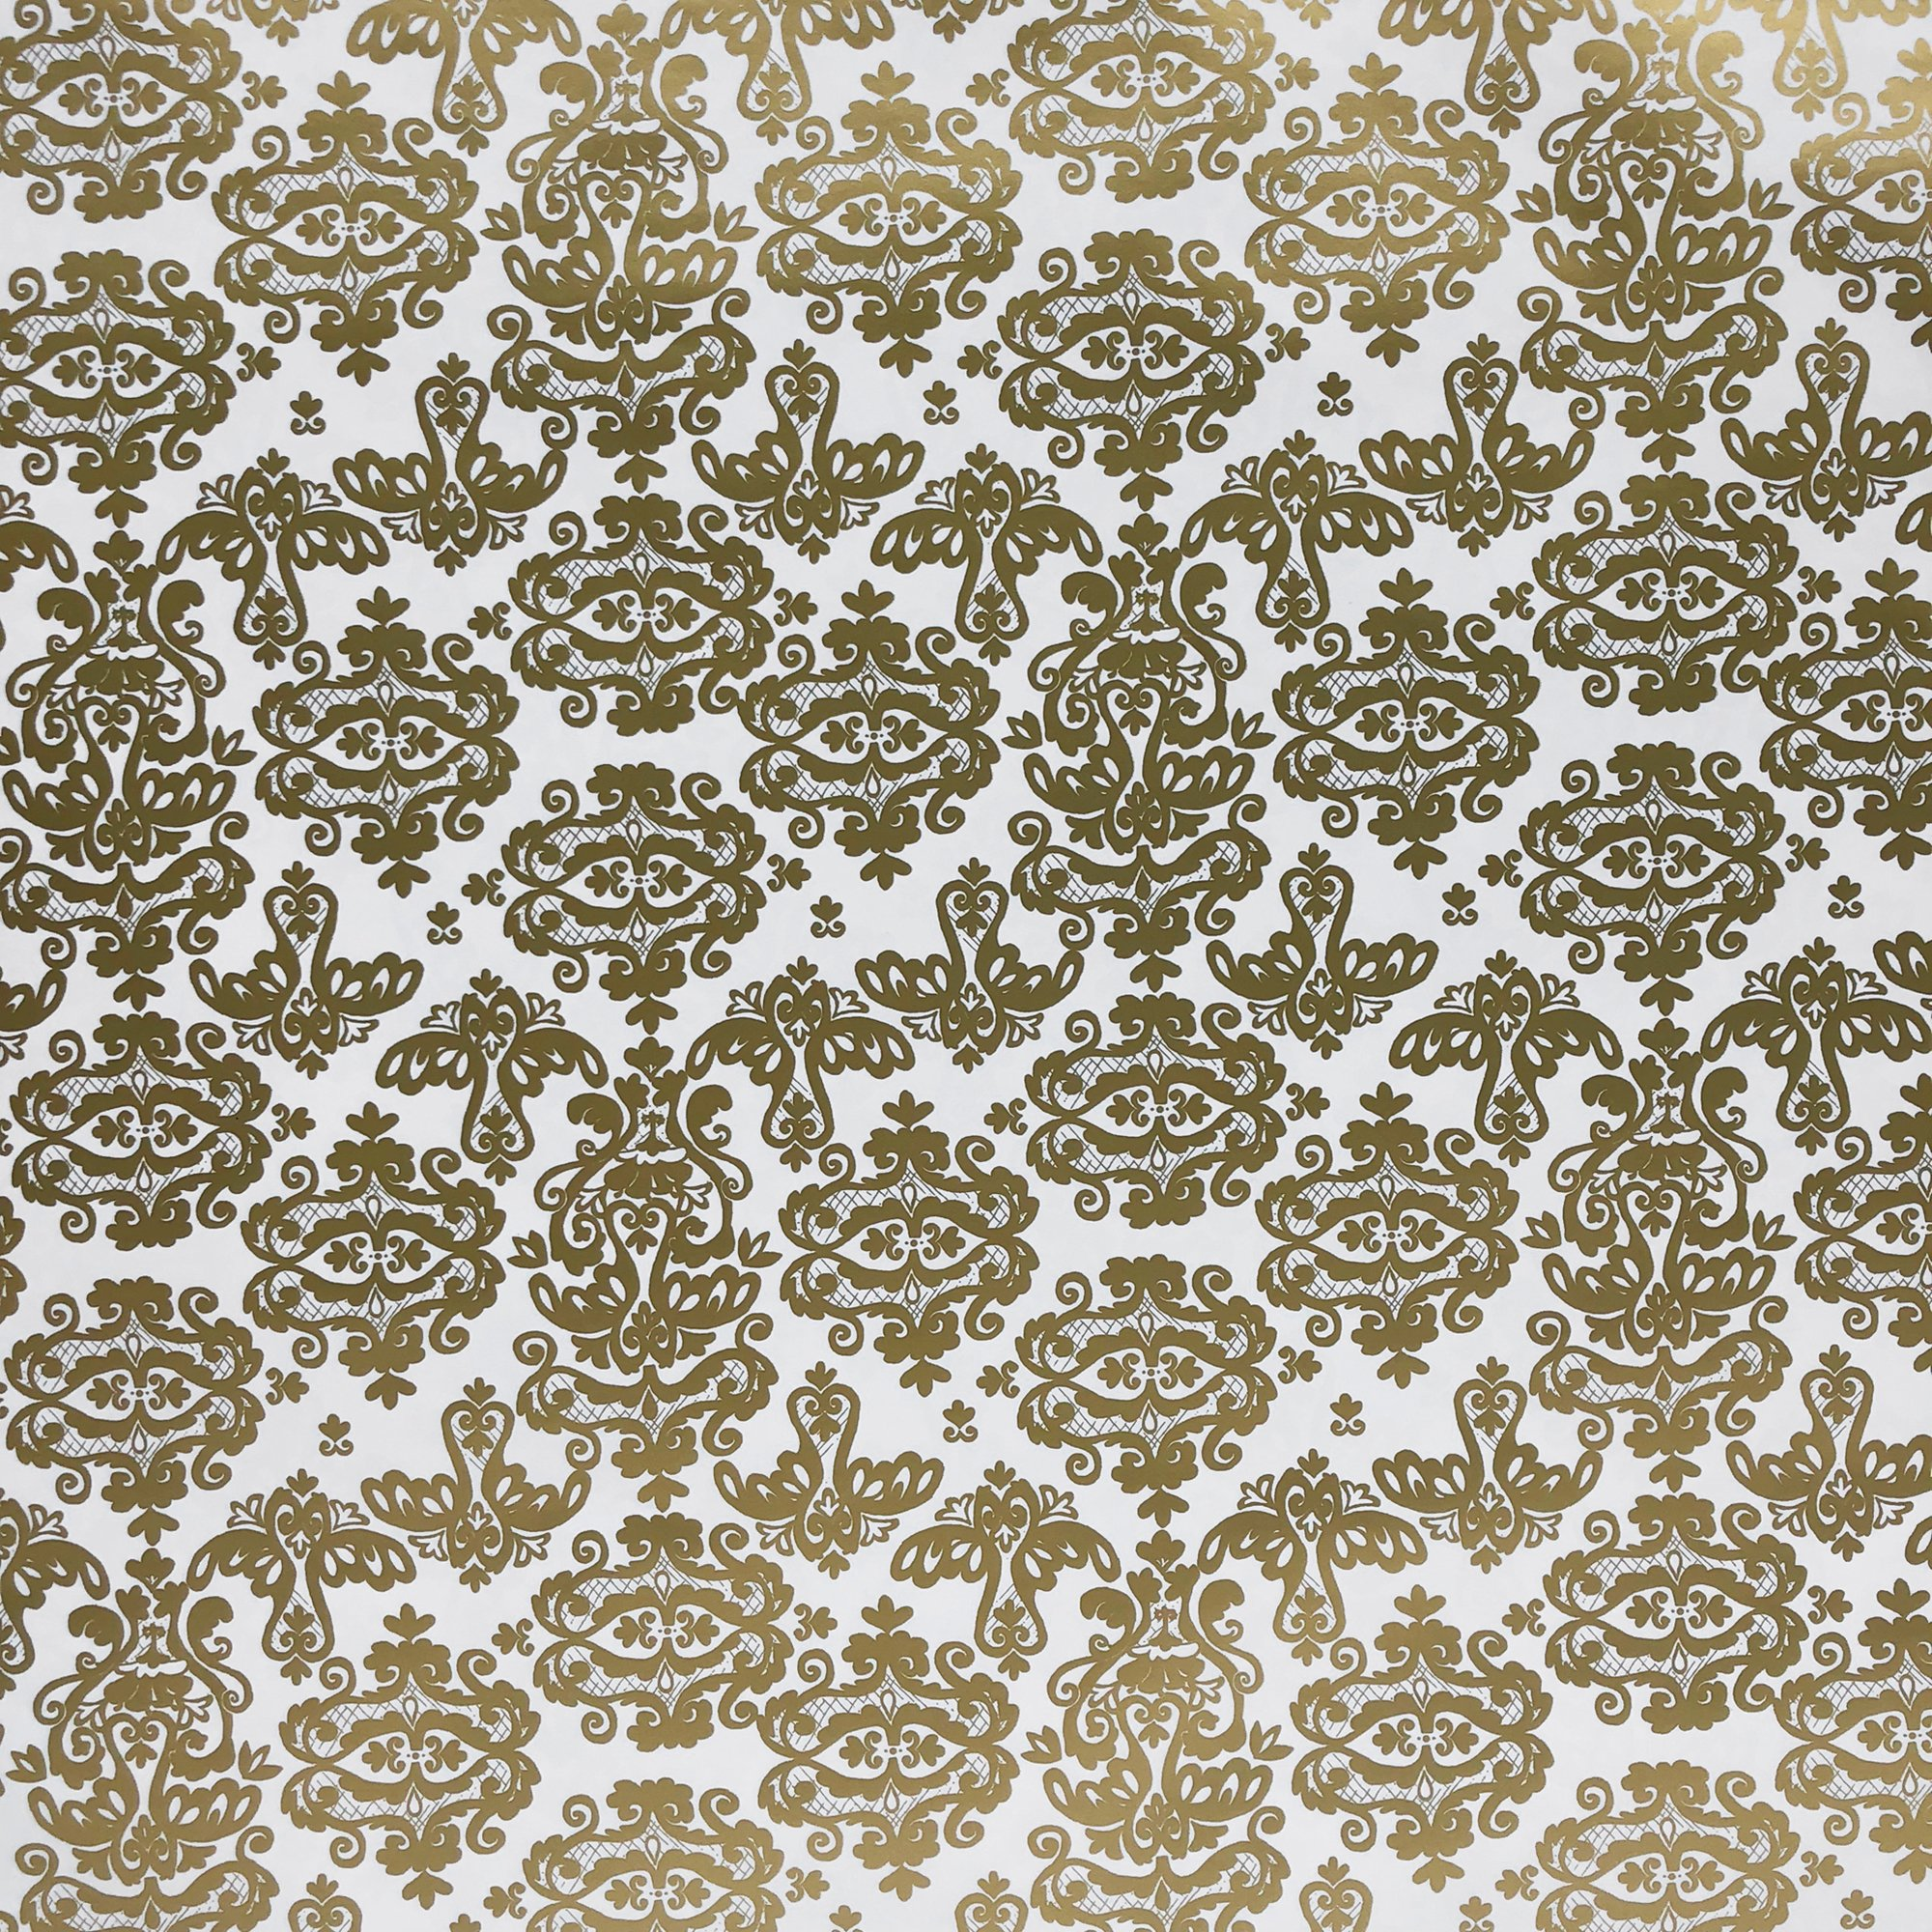 "Jillson & Roberts Gift Wrap, Damask Gold, 5' x 30"" Rolls (8 Pcs)"